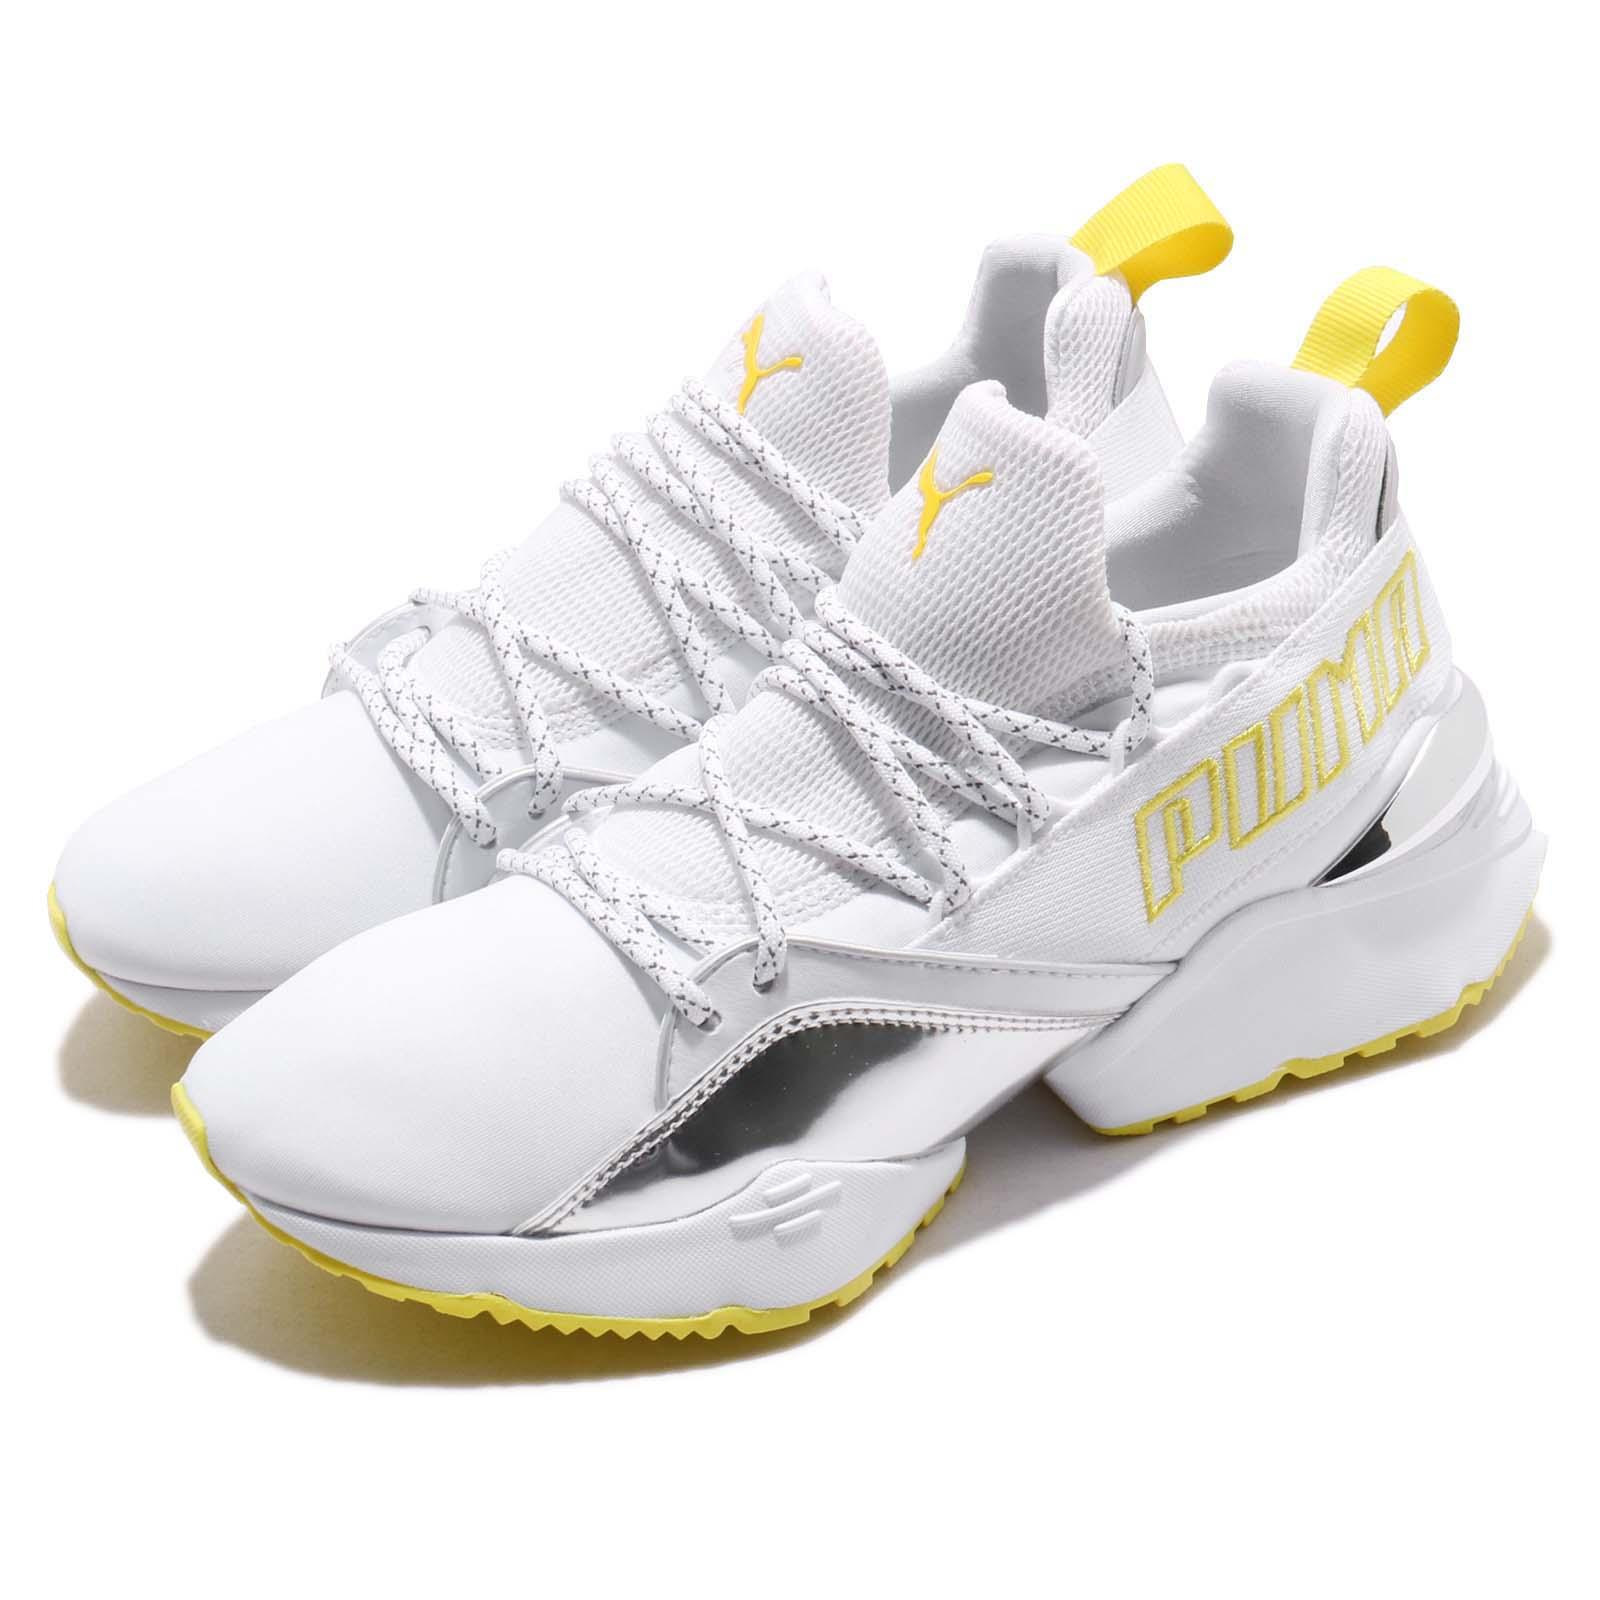 Puma 休閒鞋 Muse Maia TZ 襪套 女鞋 36949201